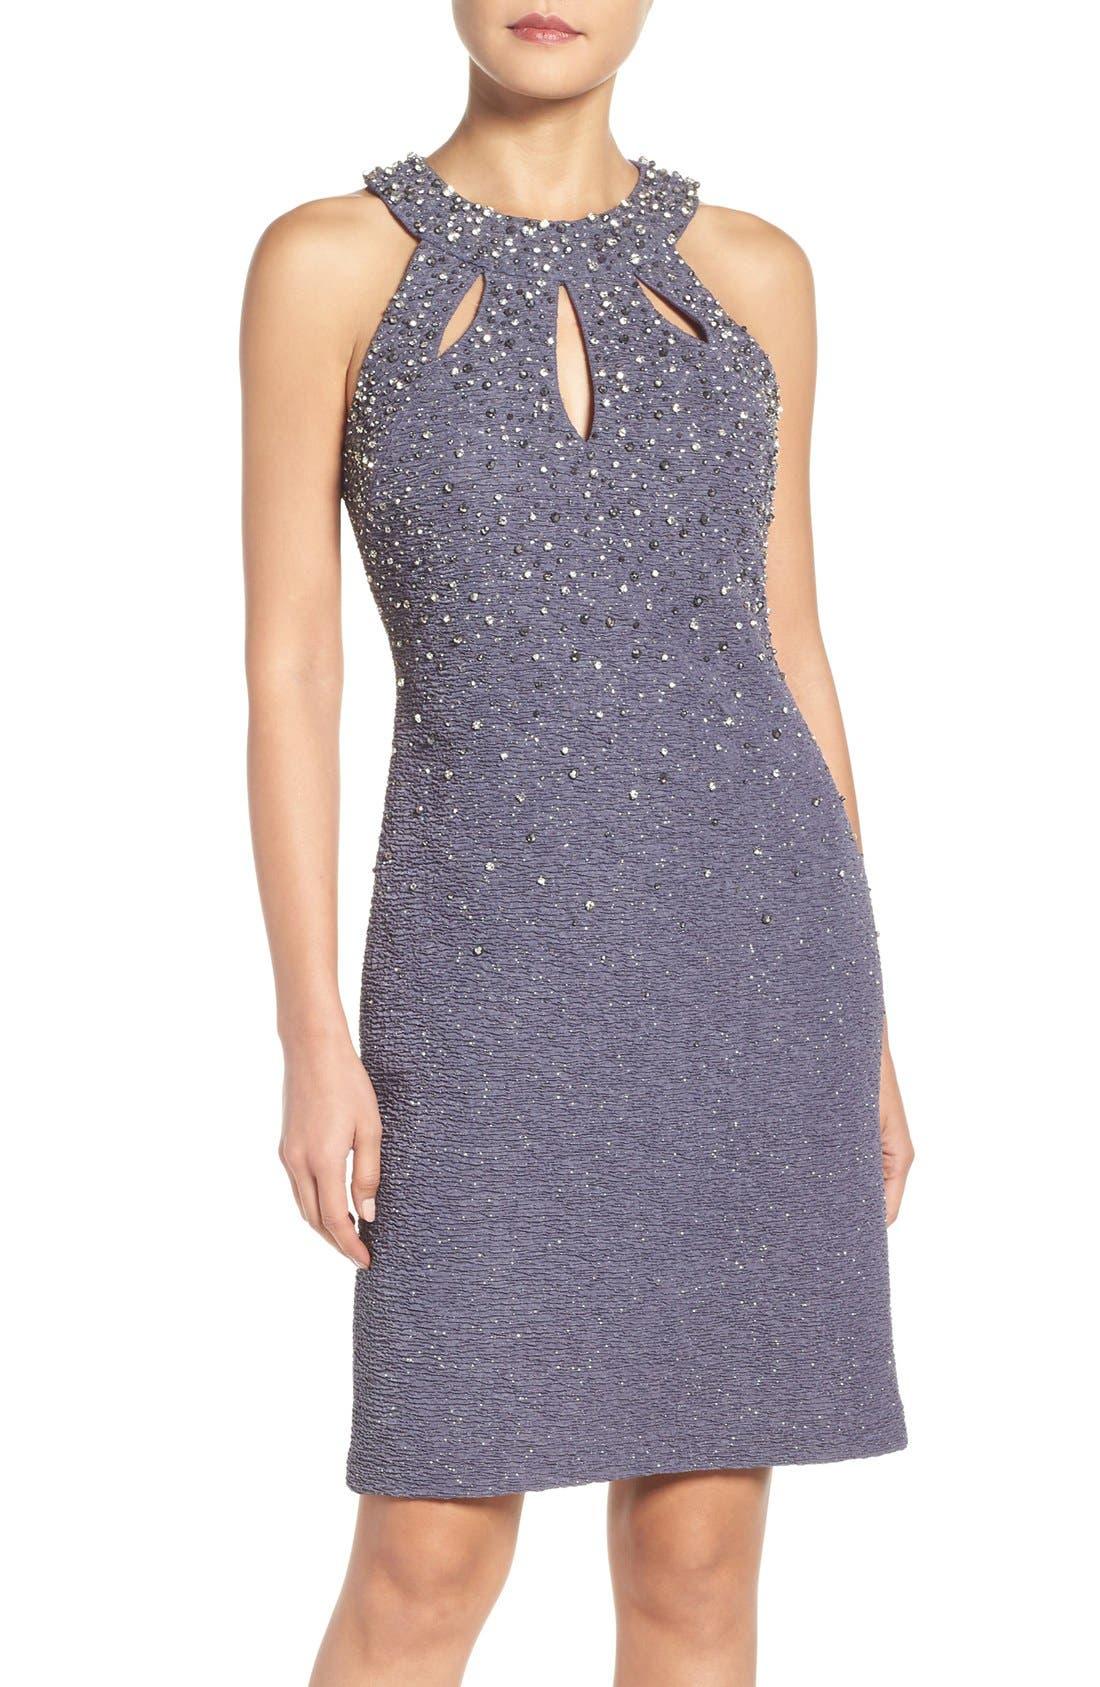 Alternate Image 1 Selected - Eliza J Embellished Sheath Dress (Regular & Petite)